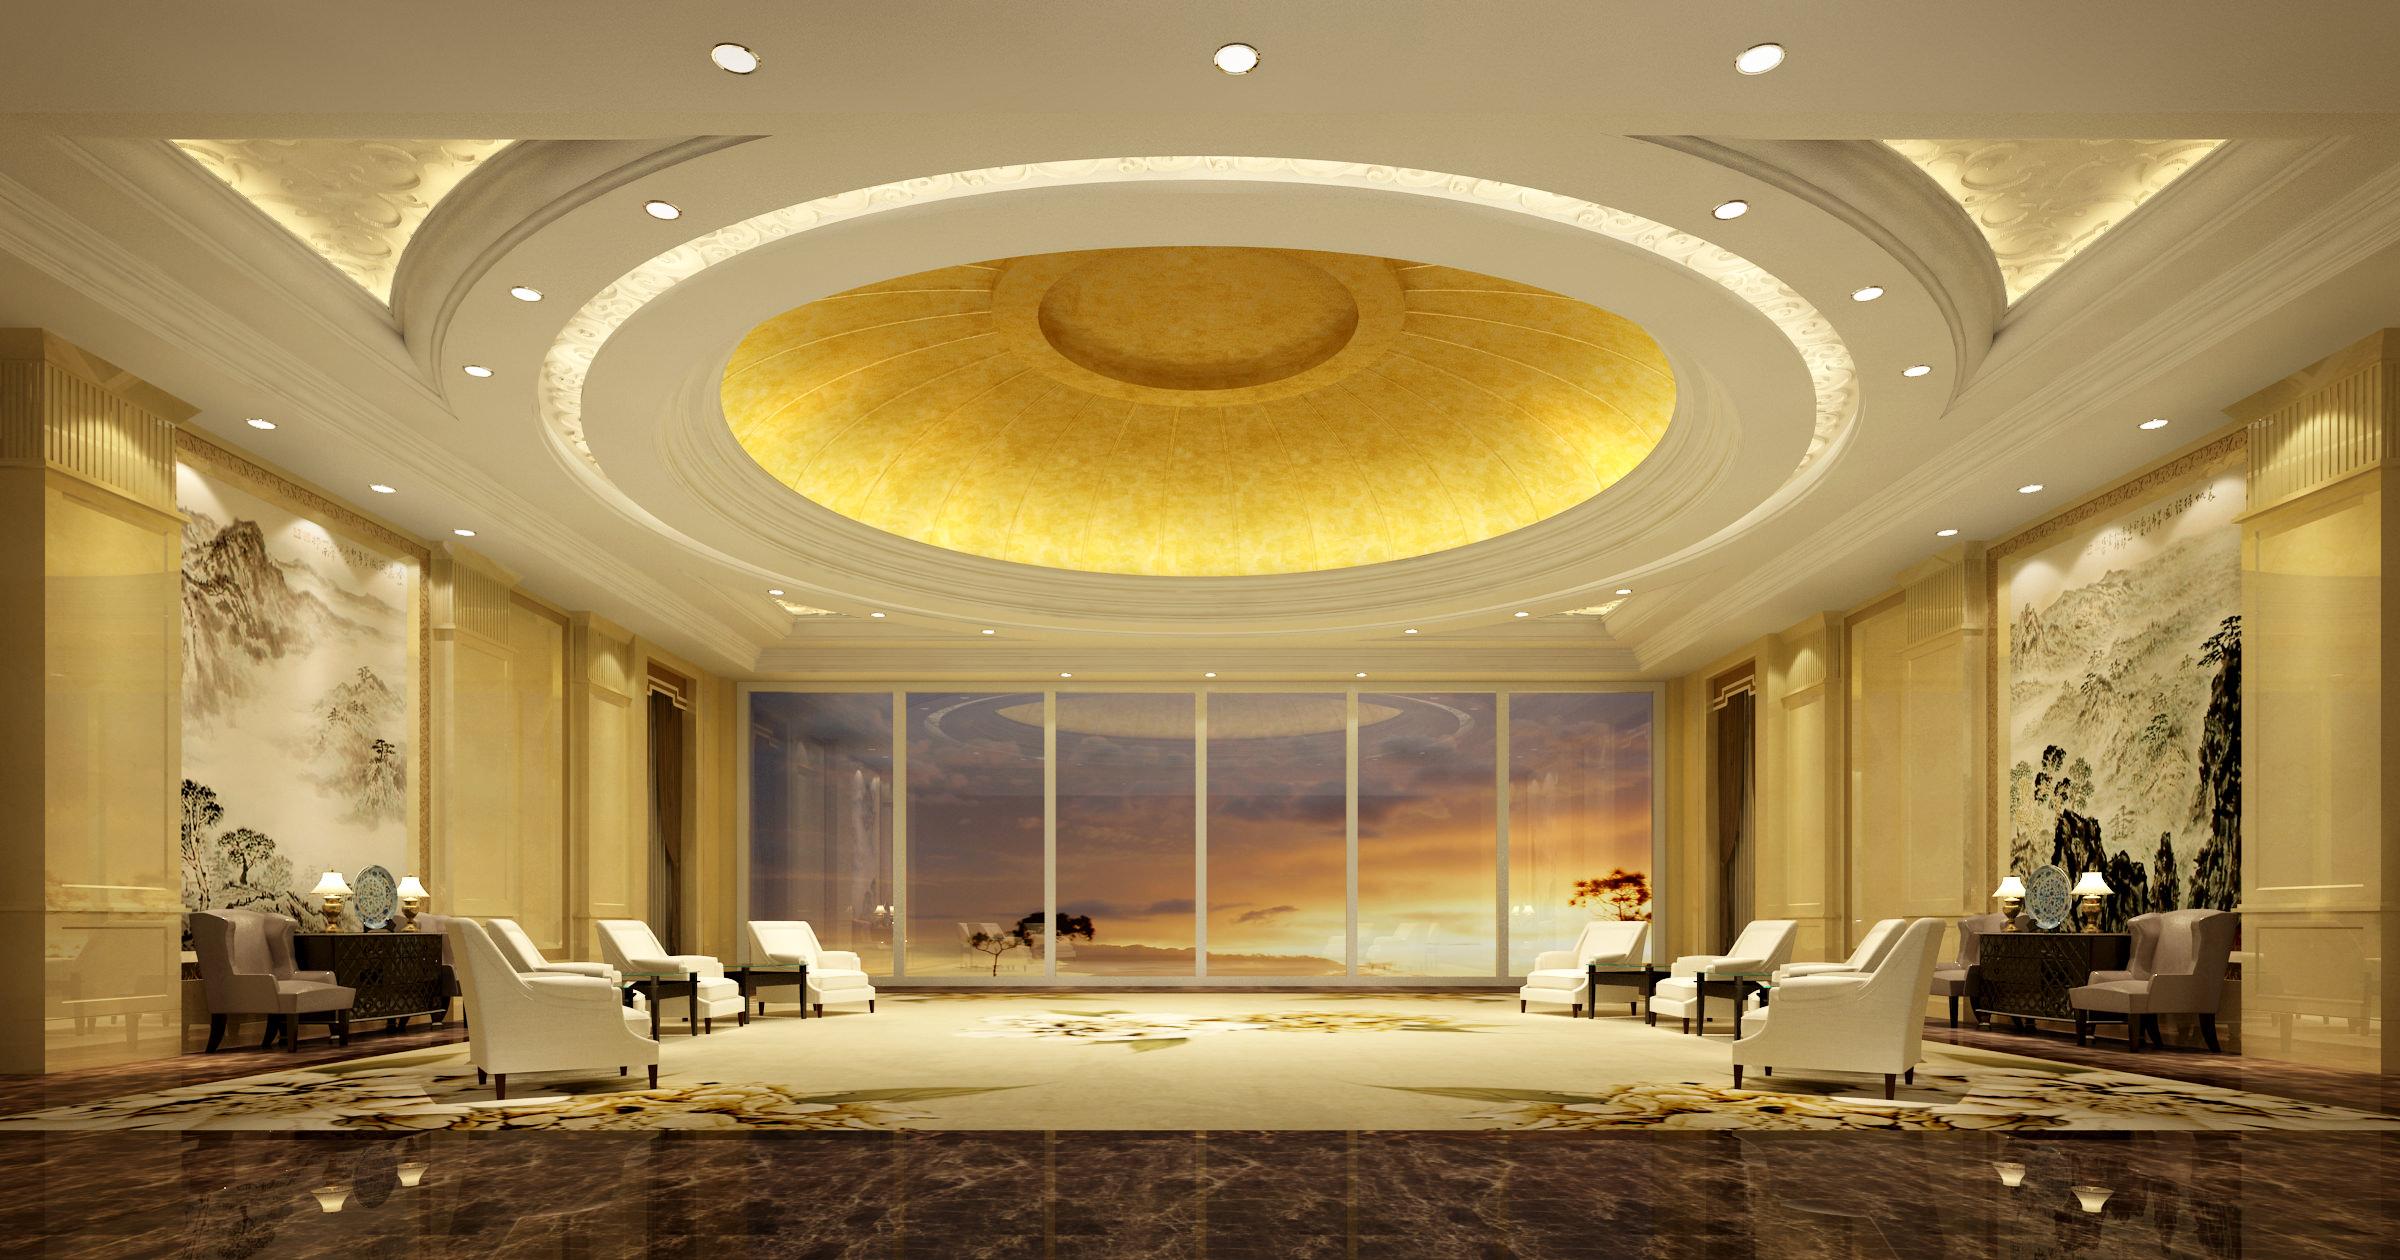 3d rendering luxury hotel lobby china luxury china hotel lobby - Lobby 3d Model Max 1